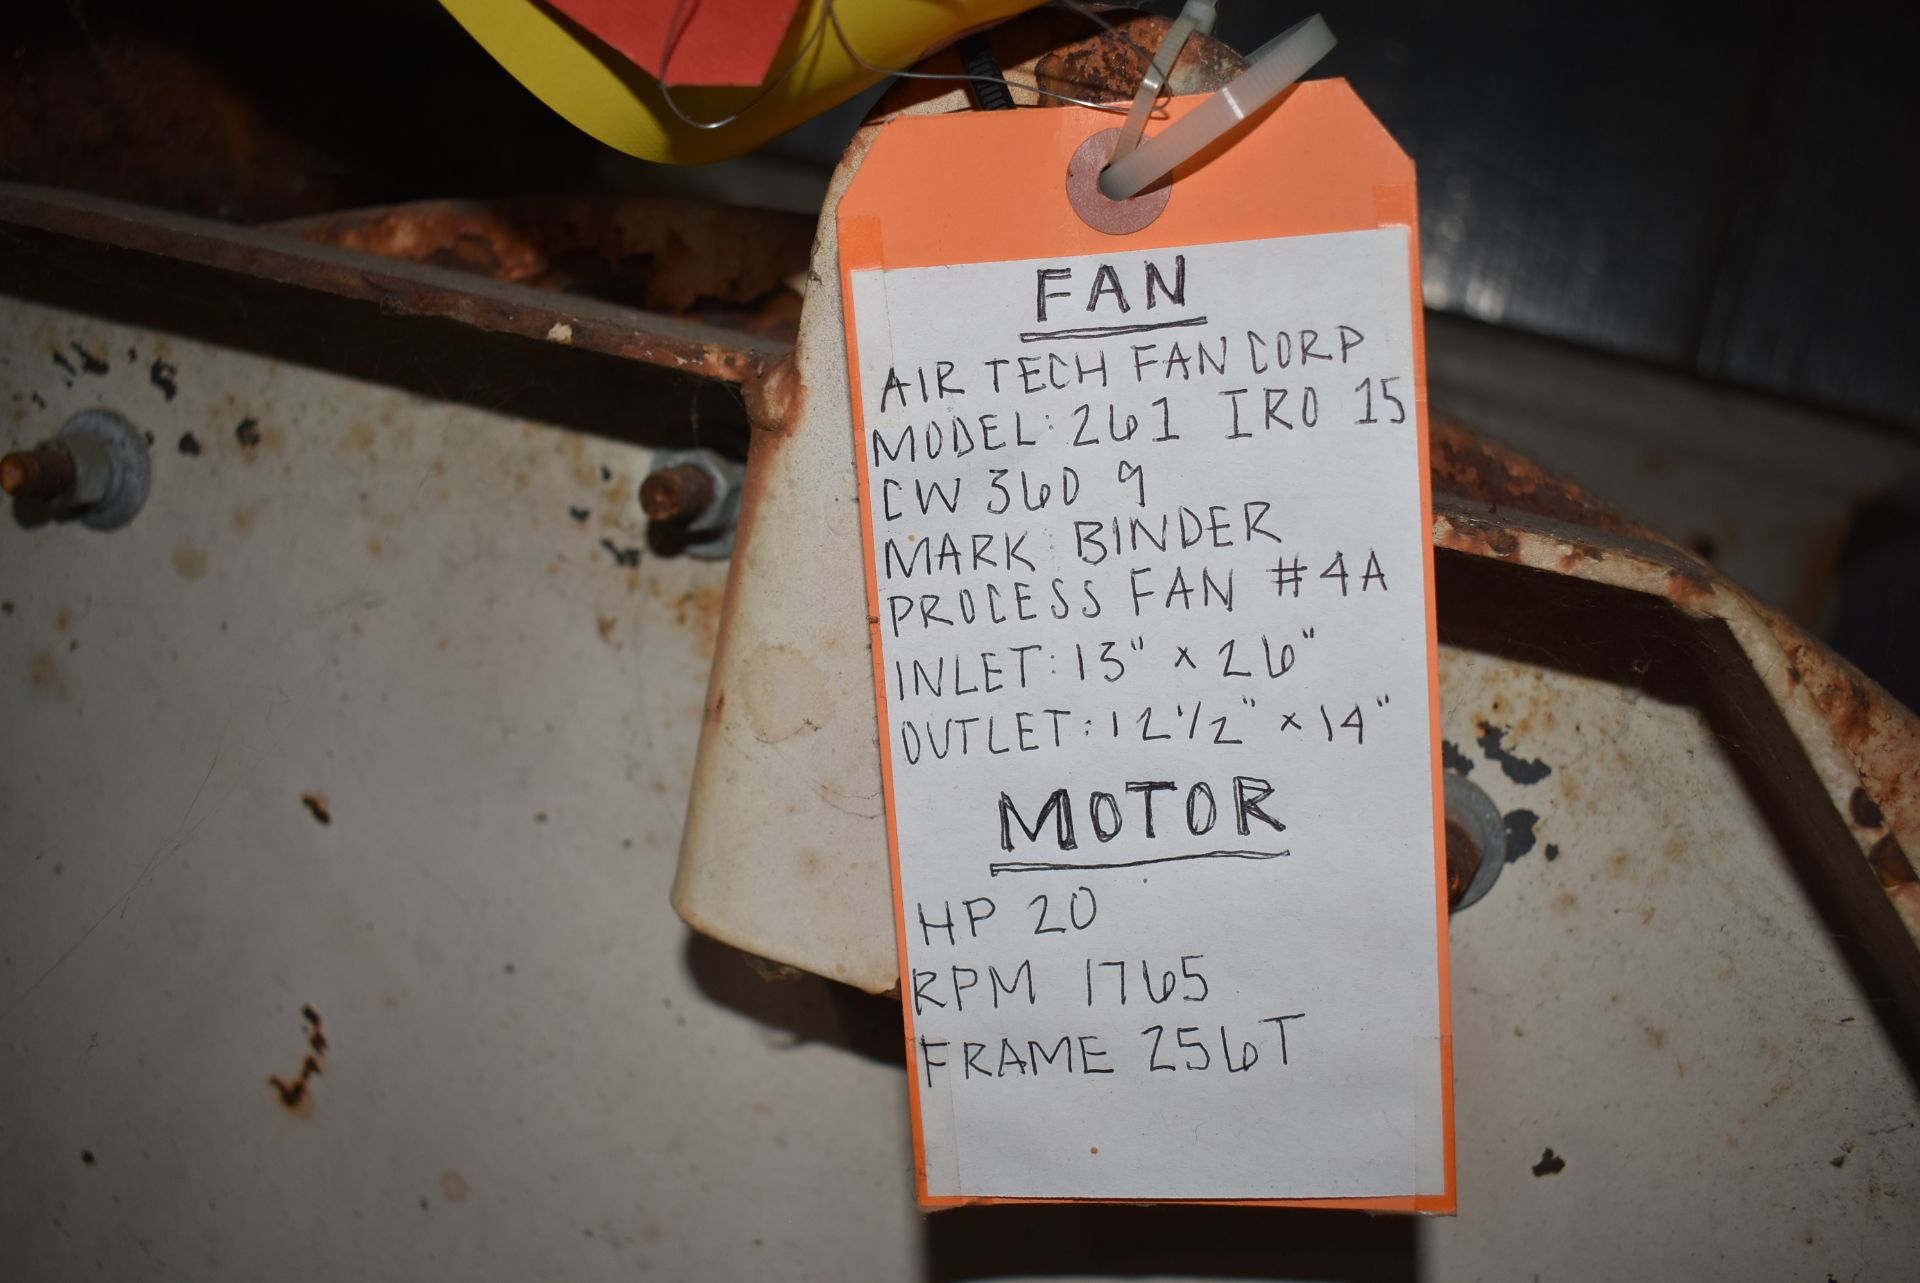 Air Tech Model #261 Blower w/20 HP Motor - Image 2 of 3